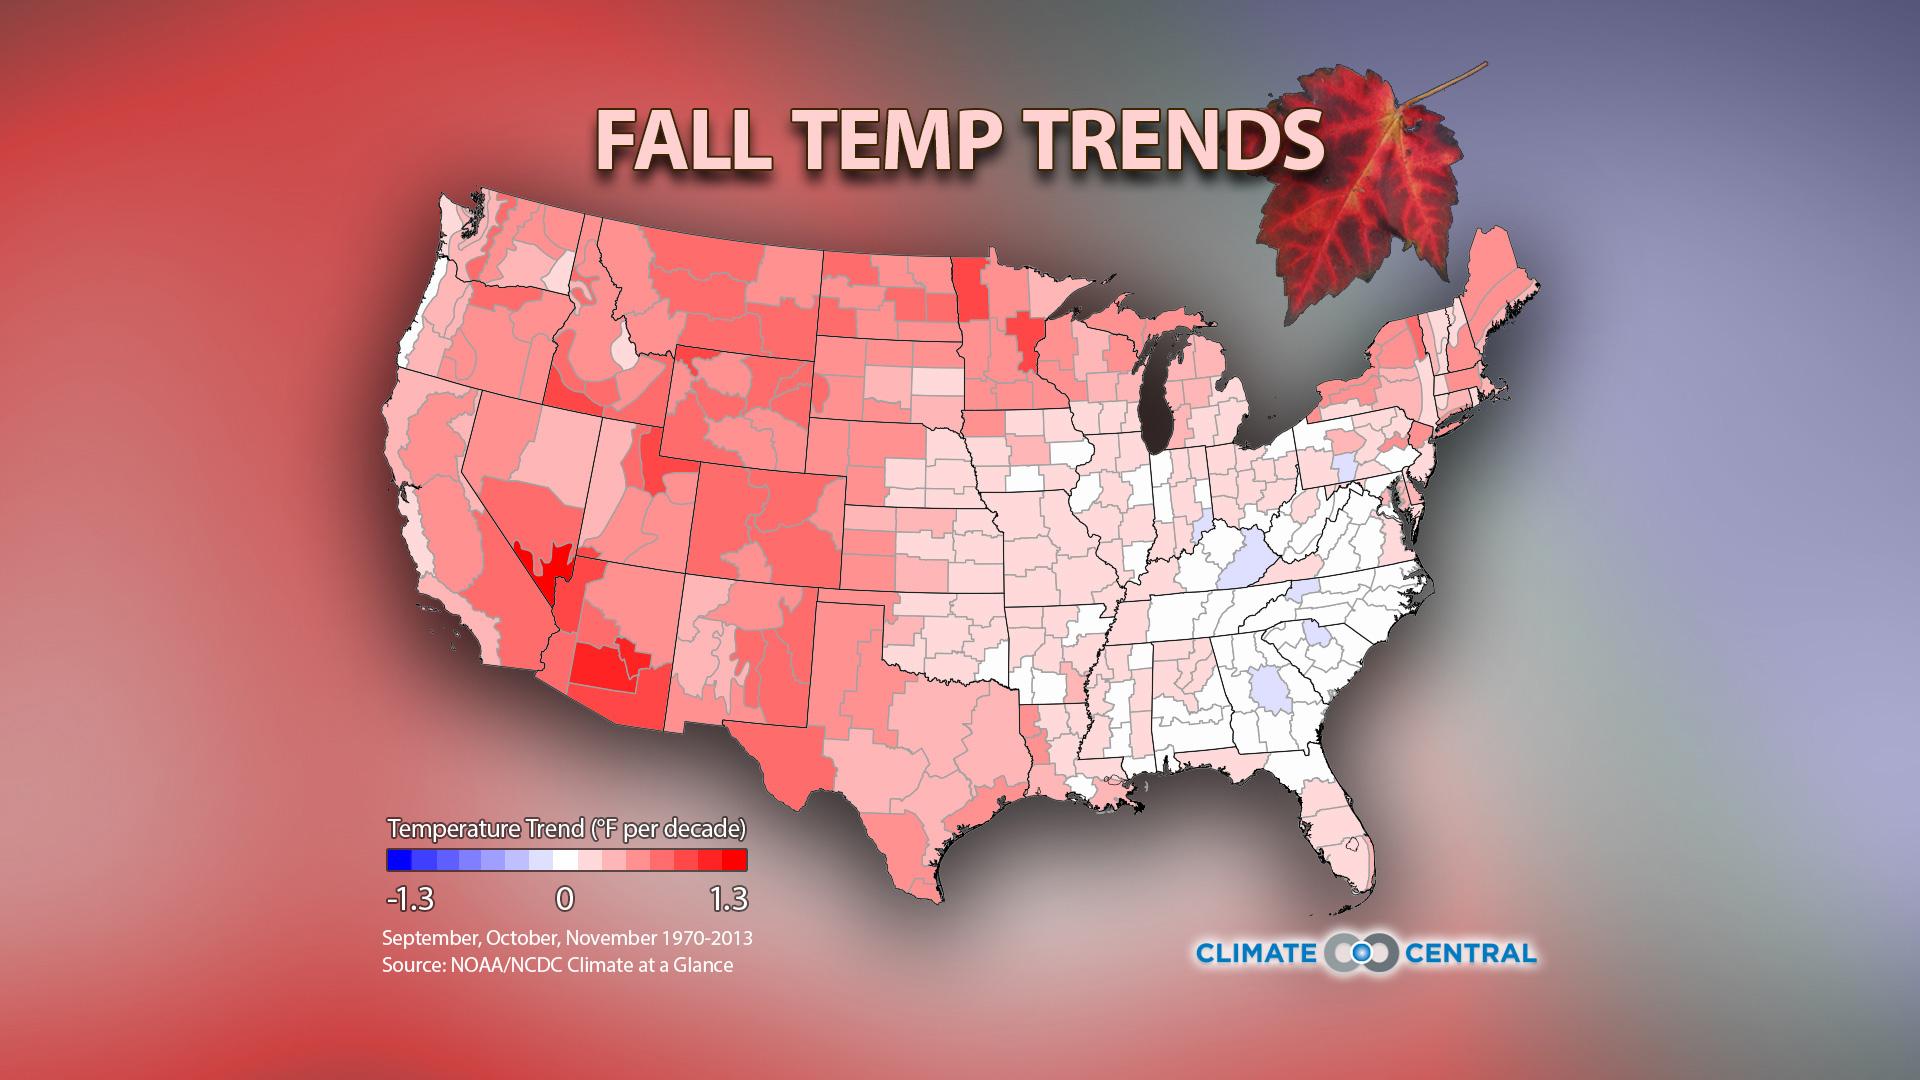 Fall Temperature Trends